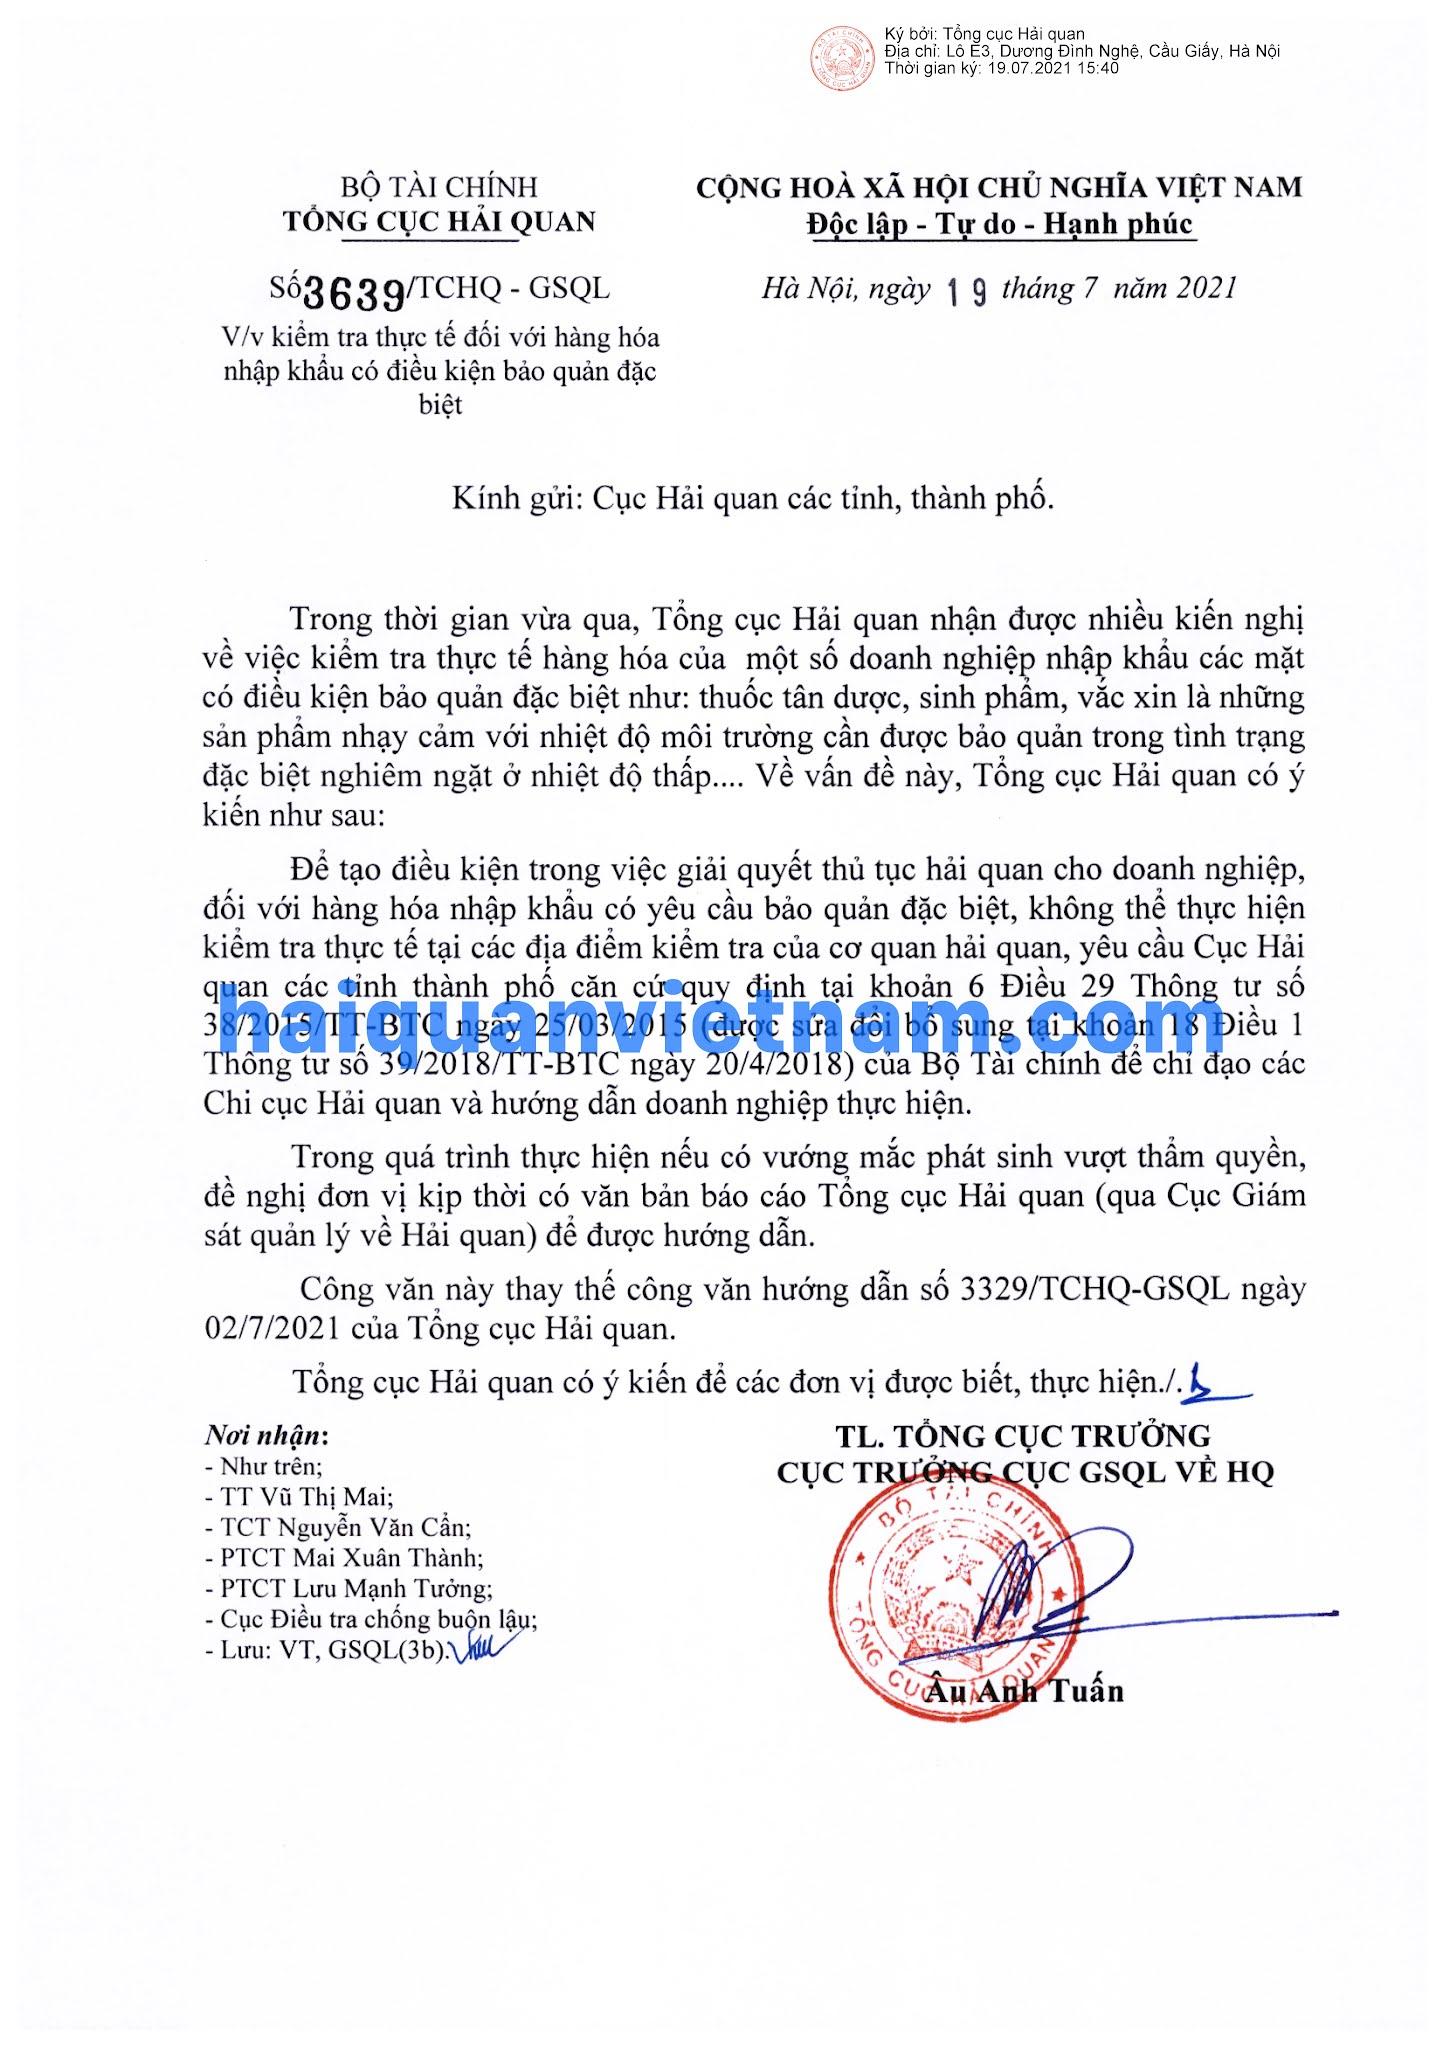 [Image: 210719%2B-%2B3639-TCHQ-GSQL_haiquanvietnam_01.jpg]